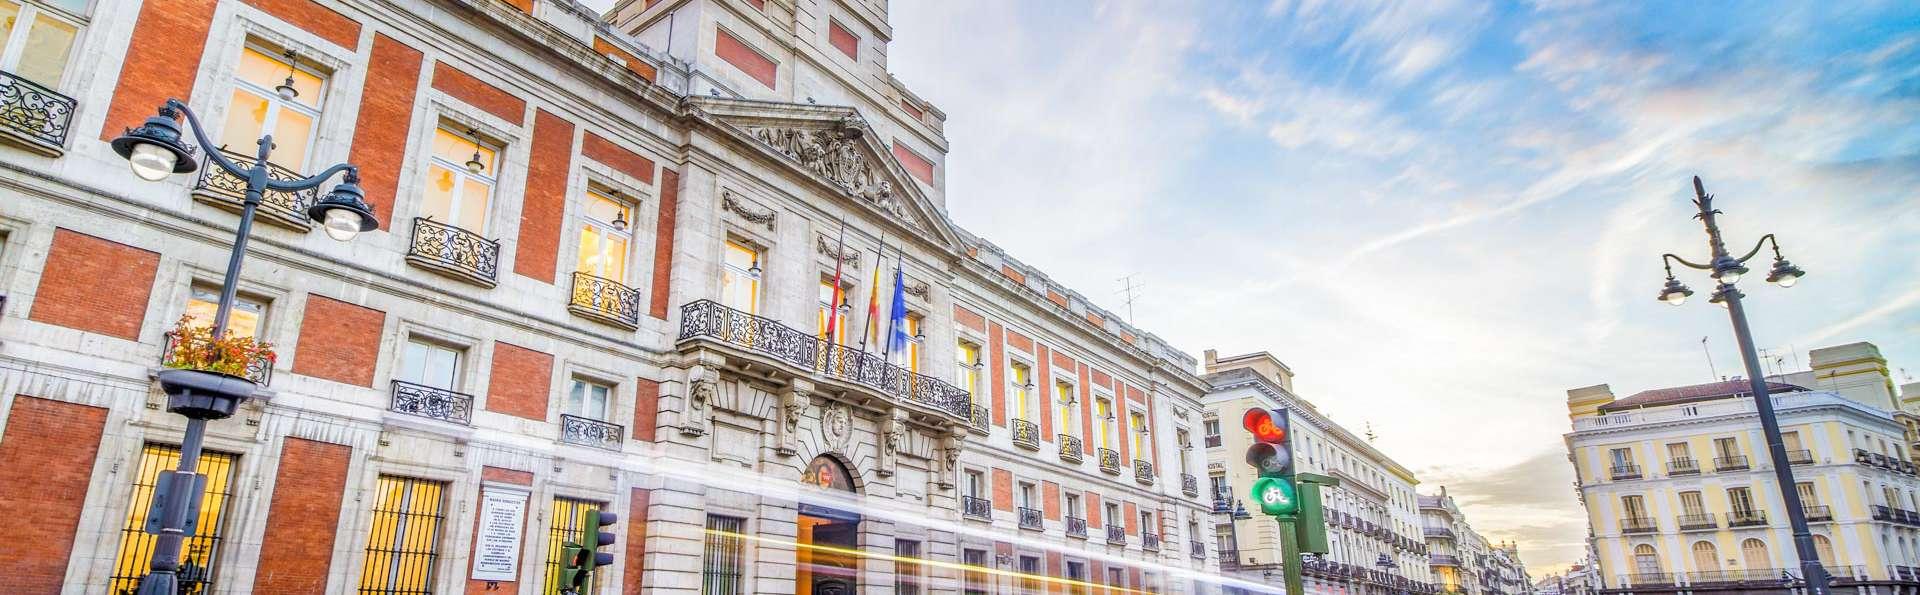 Hotel LCB Fuenlabrada - EDIT_DESTINATION_02.jpg